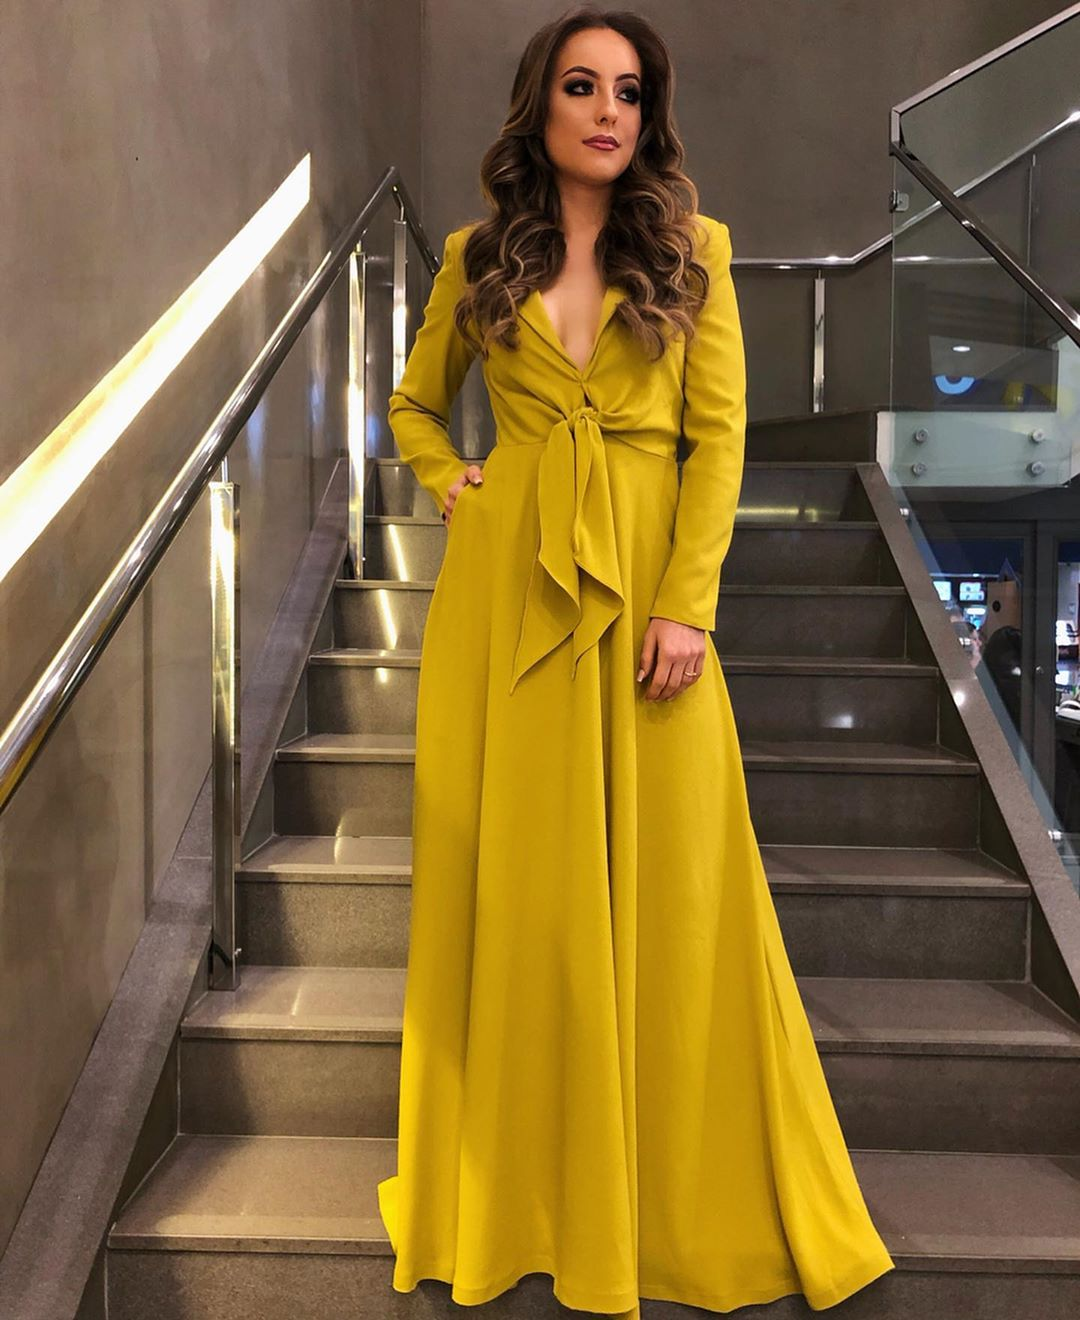 cristine boff sartor, segunda finalista de miss latinoamerica 2019. - Página 6 62235611